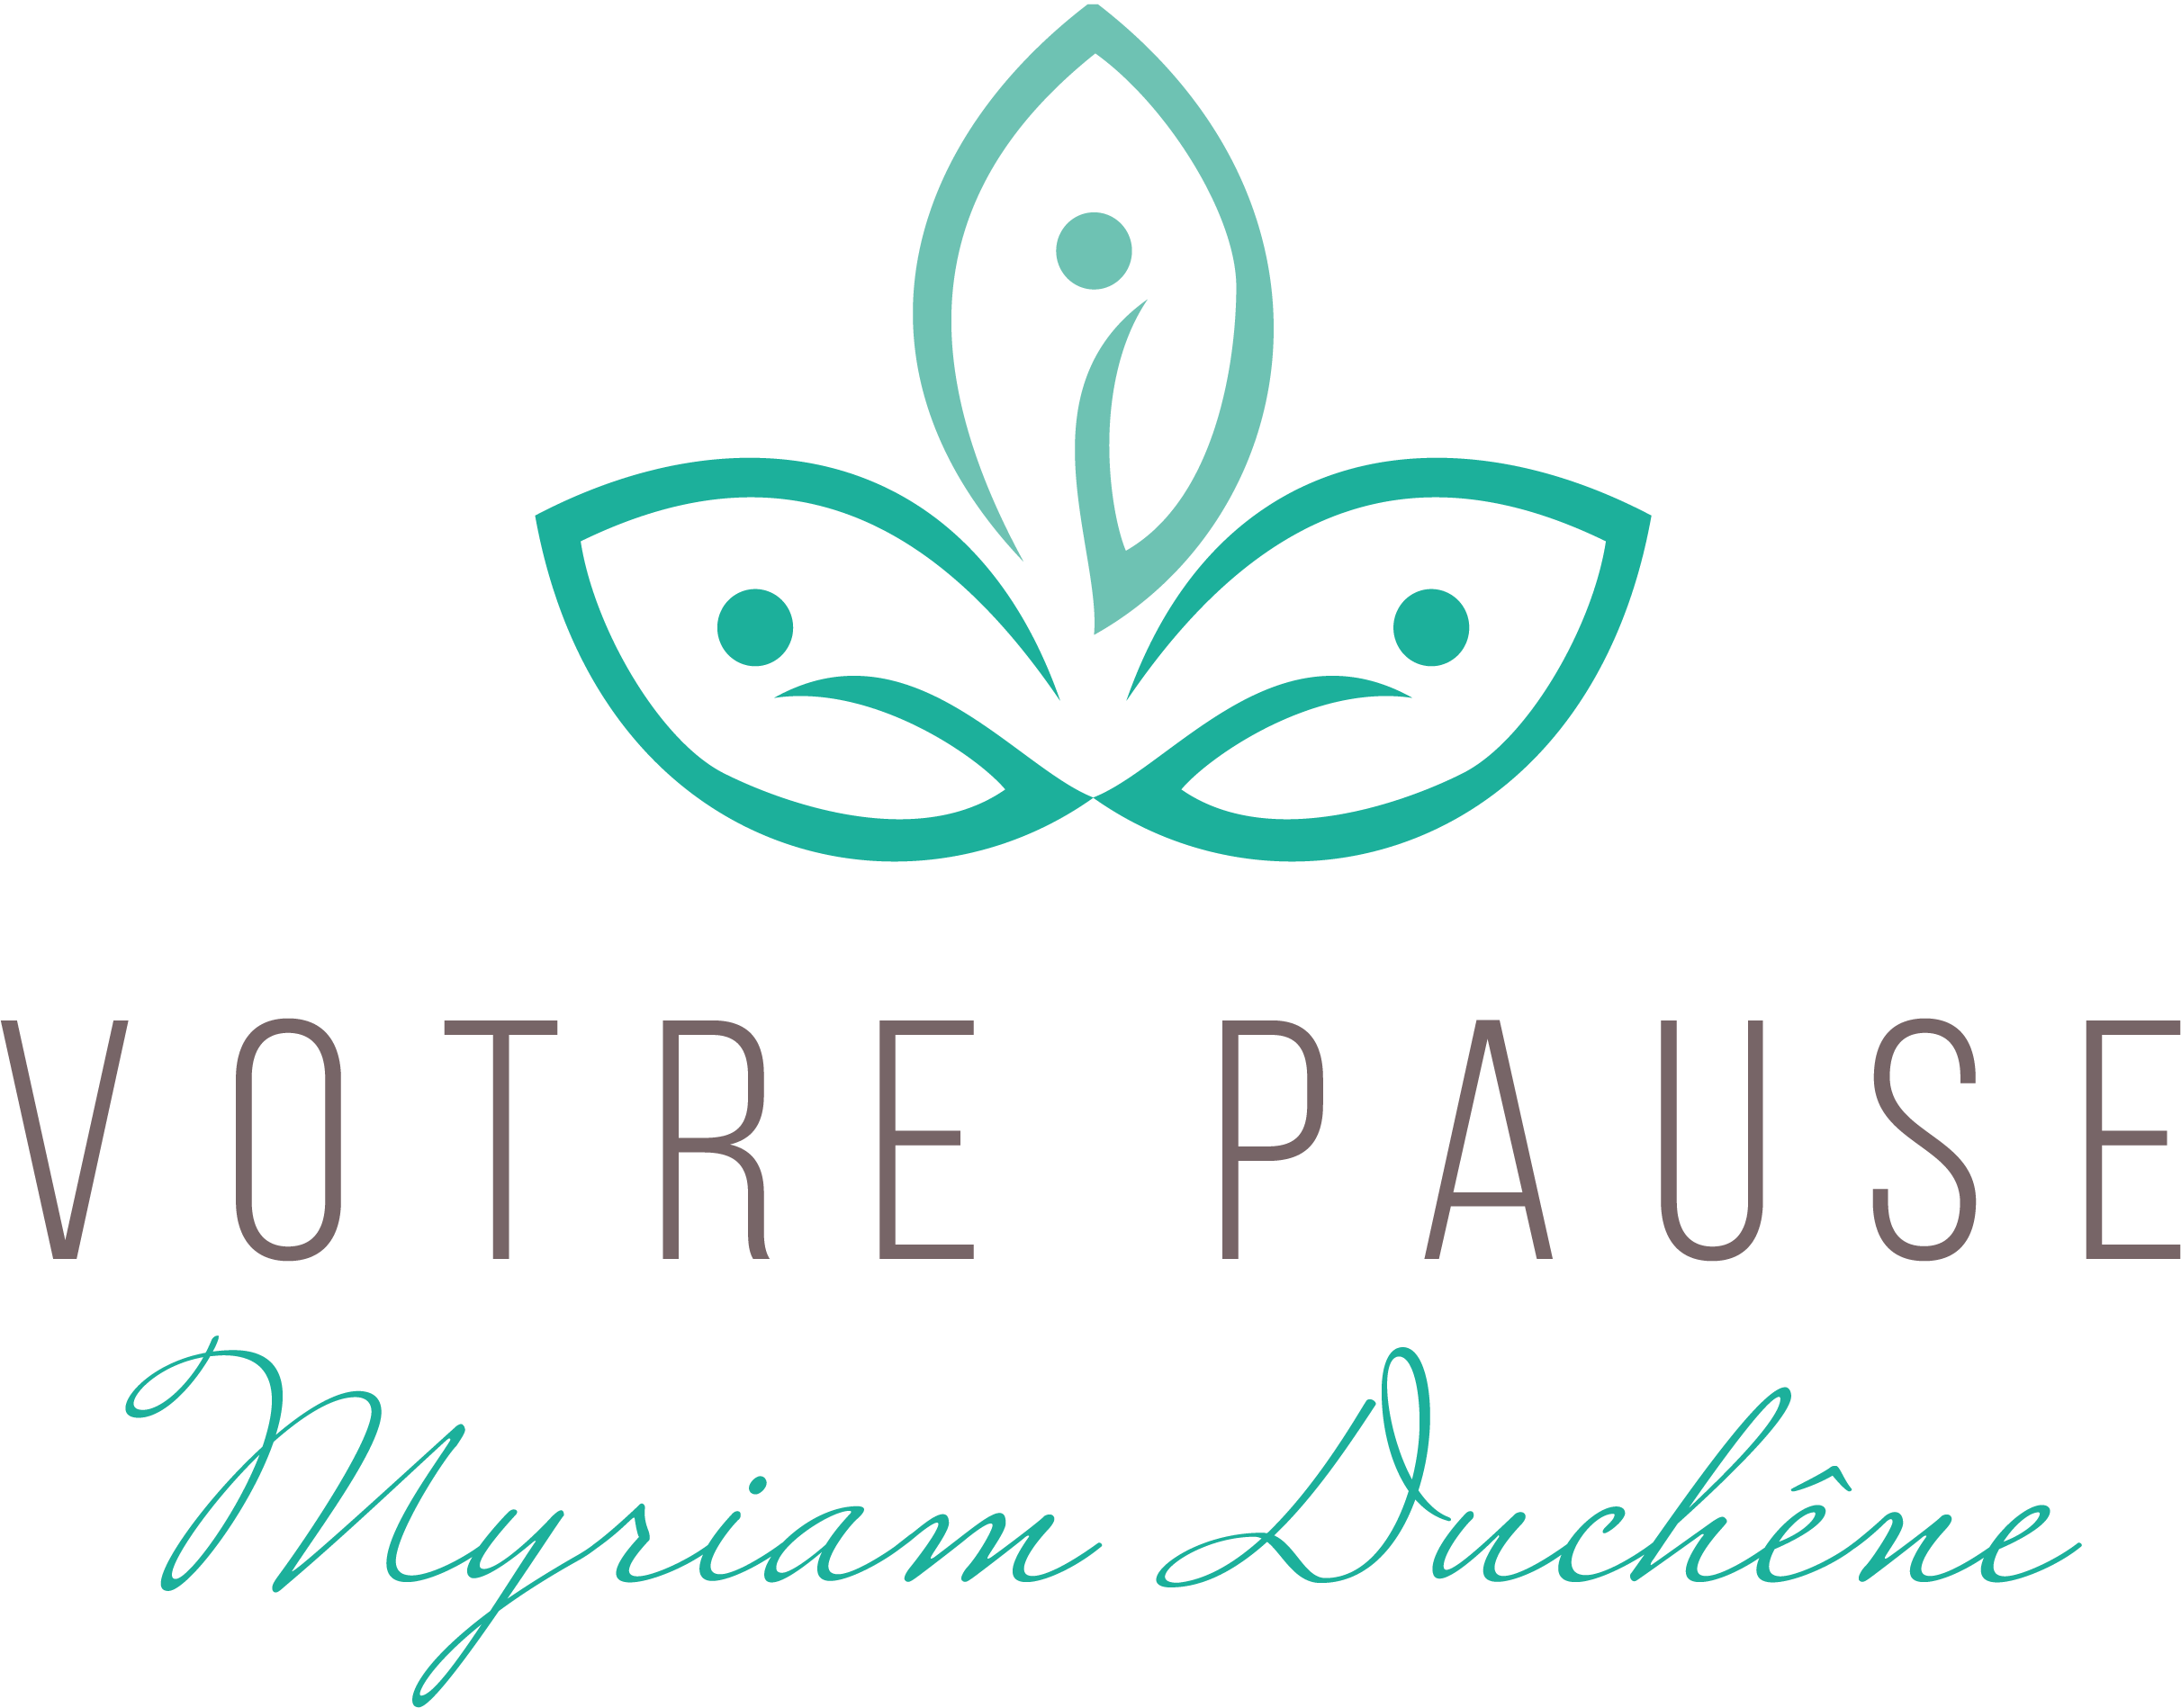 www.votrepause.ch